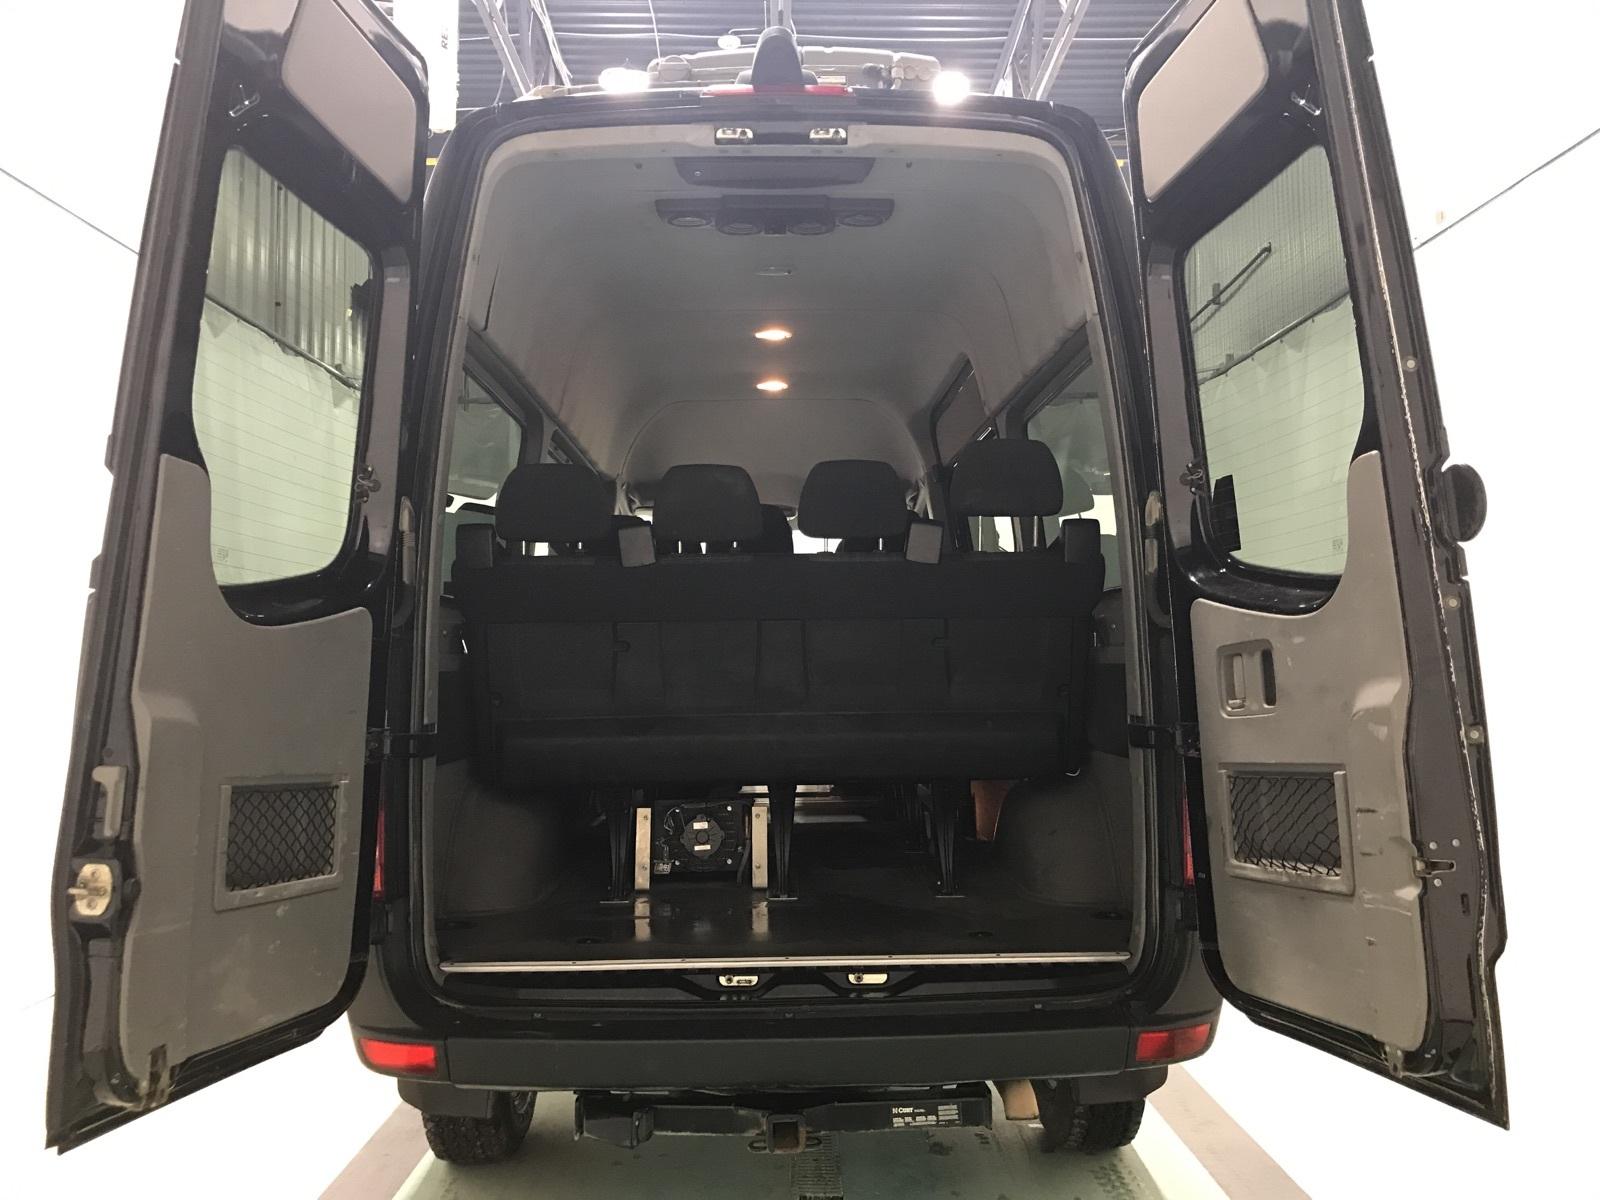 2017 Mercedes-Benz Sprinter Passenger Van 4X4 2500 V6 144» HIGH ROOF 12 PASSENGER complet